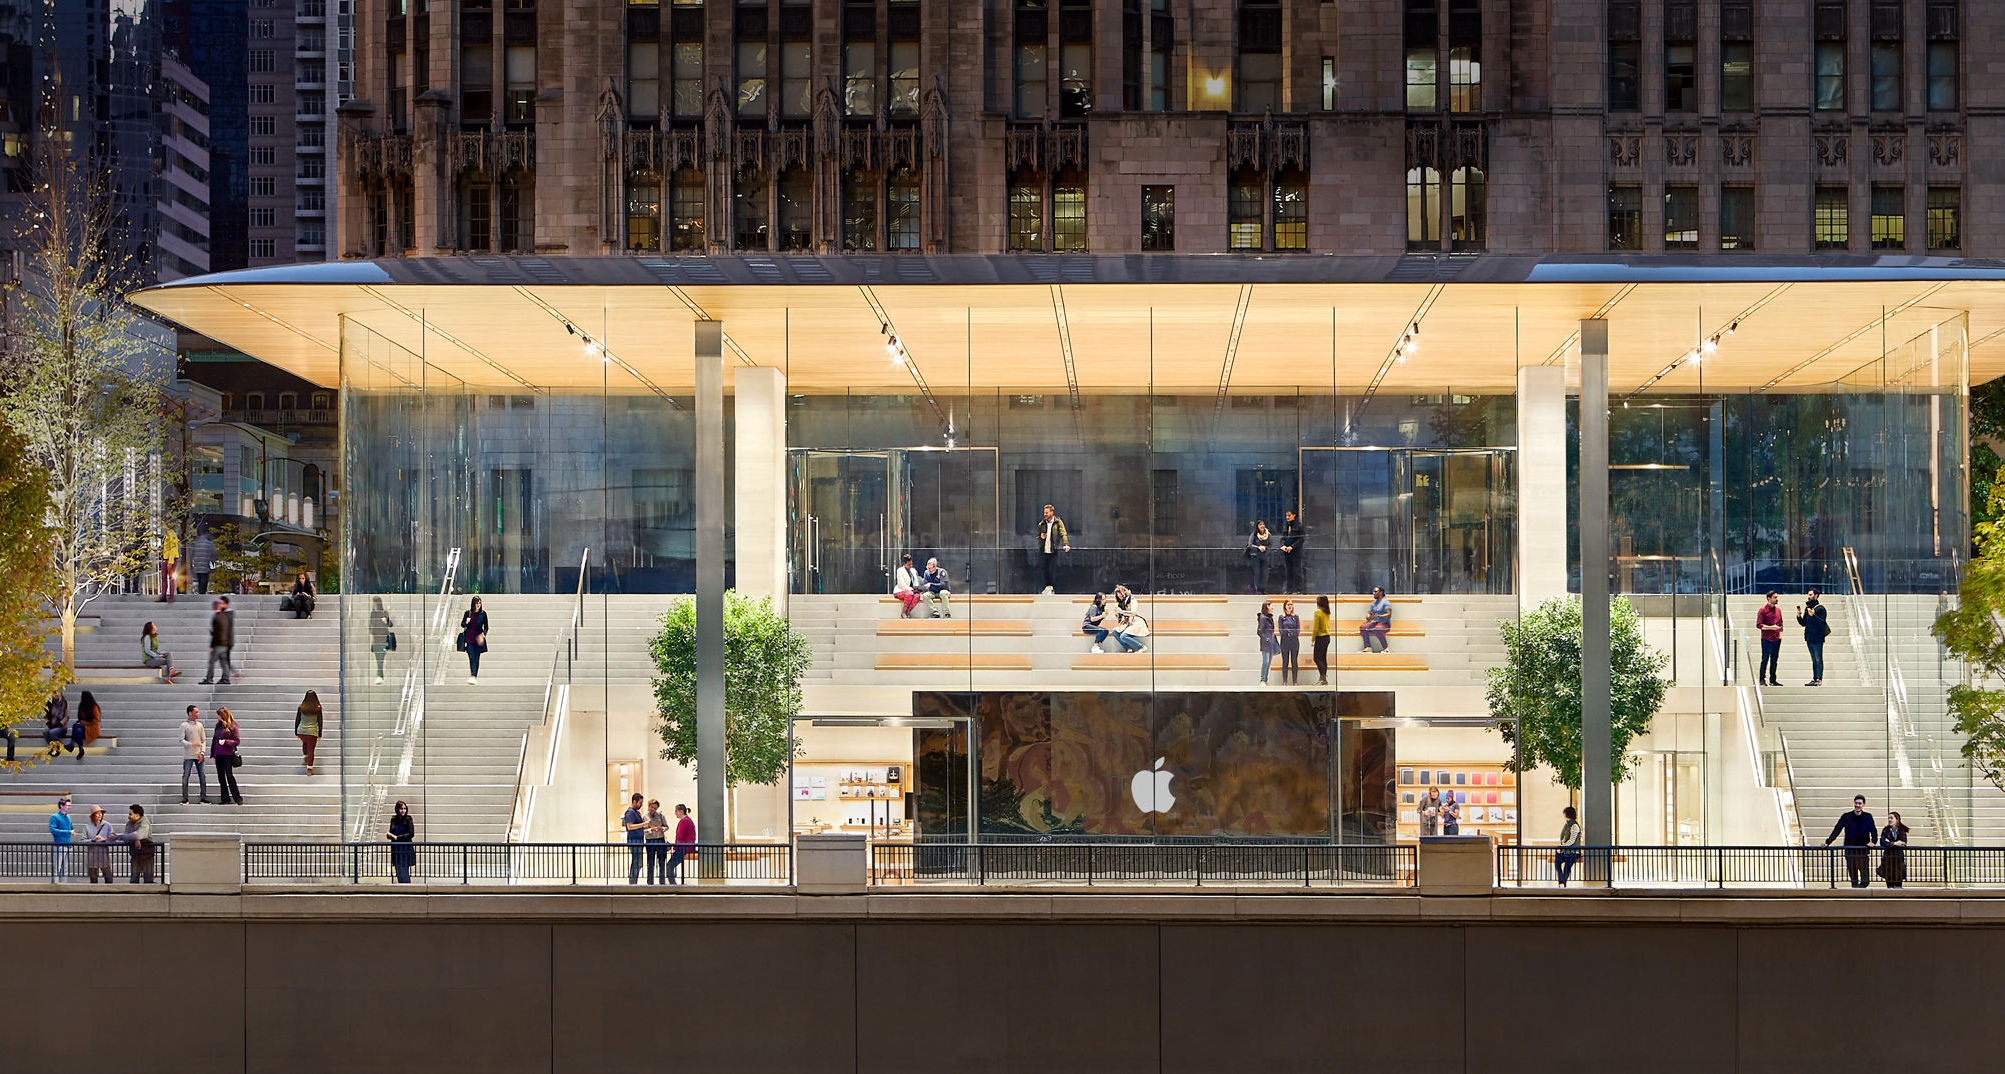 Магазин Apple на Michigan Avenue в Чикаго, США